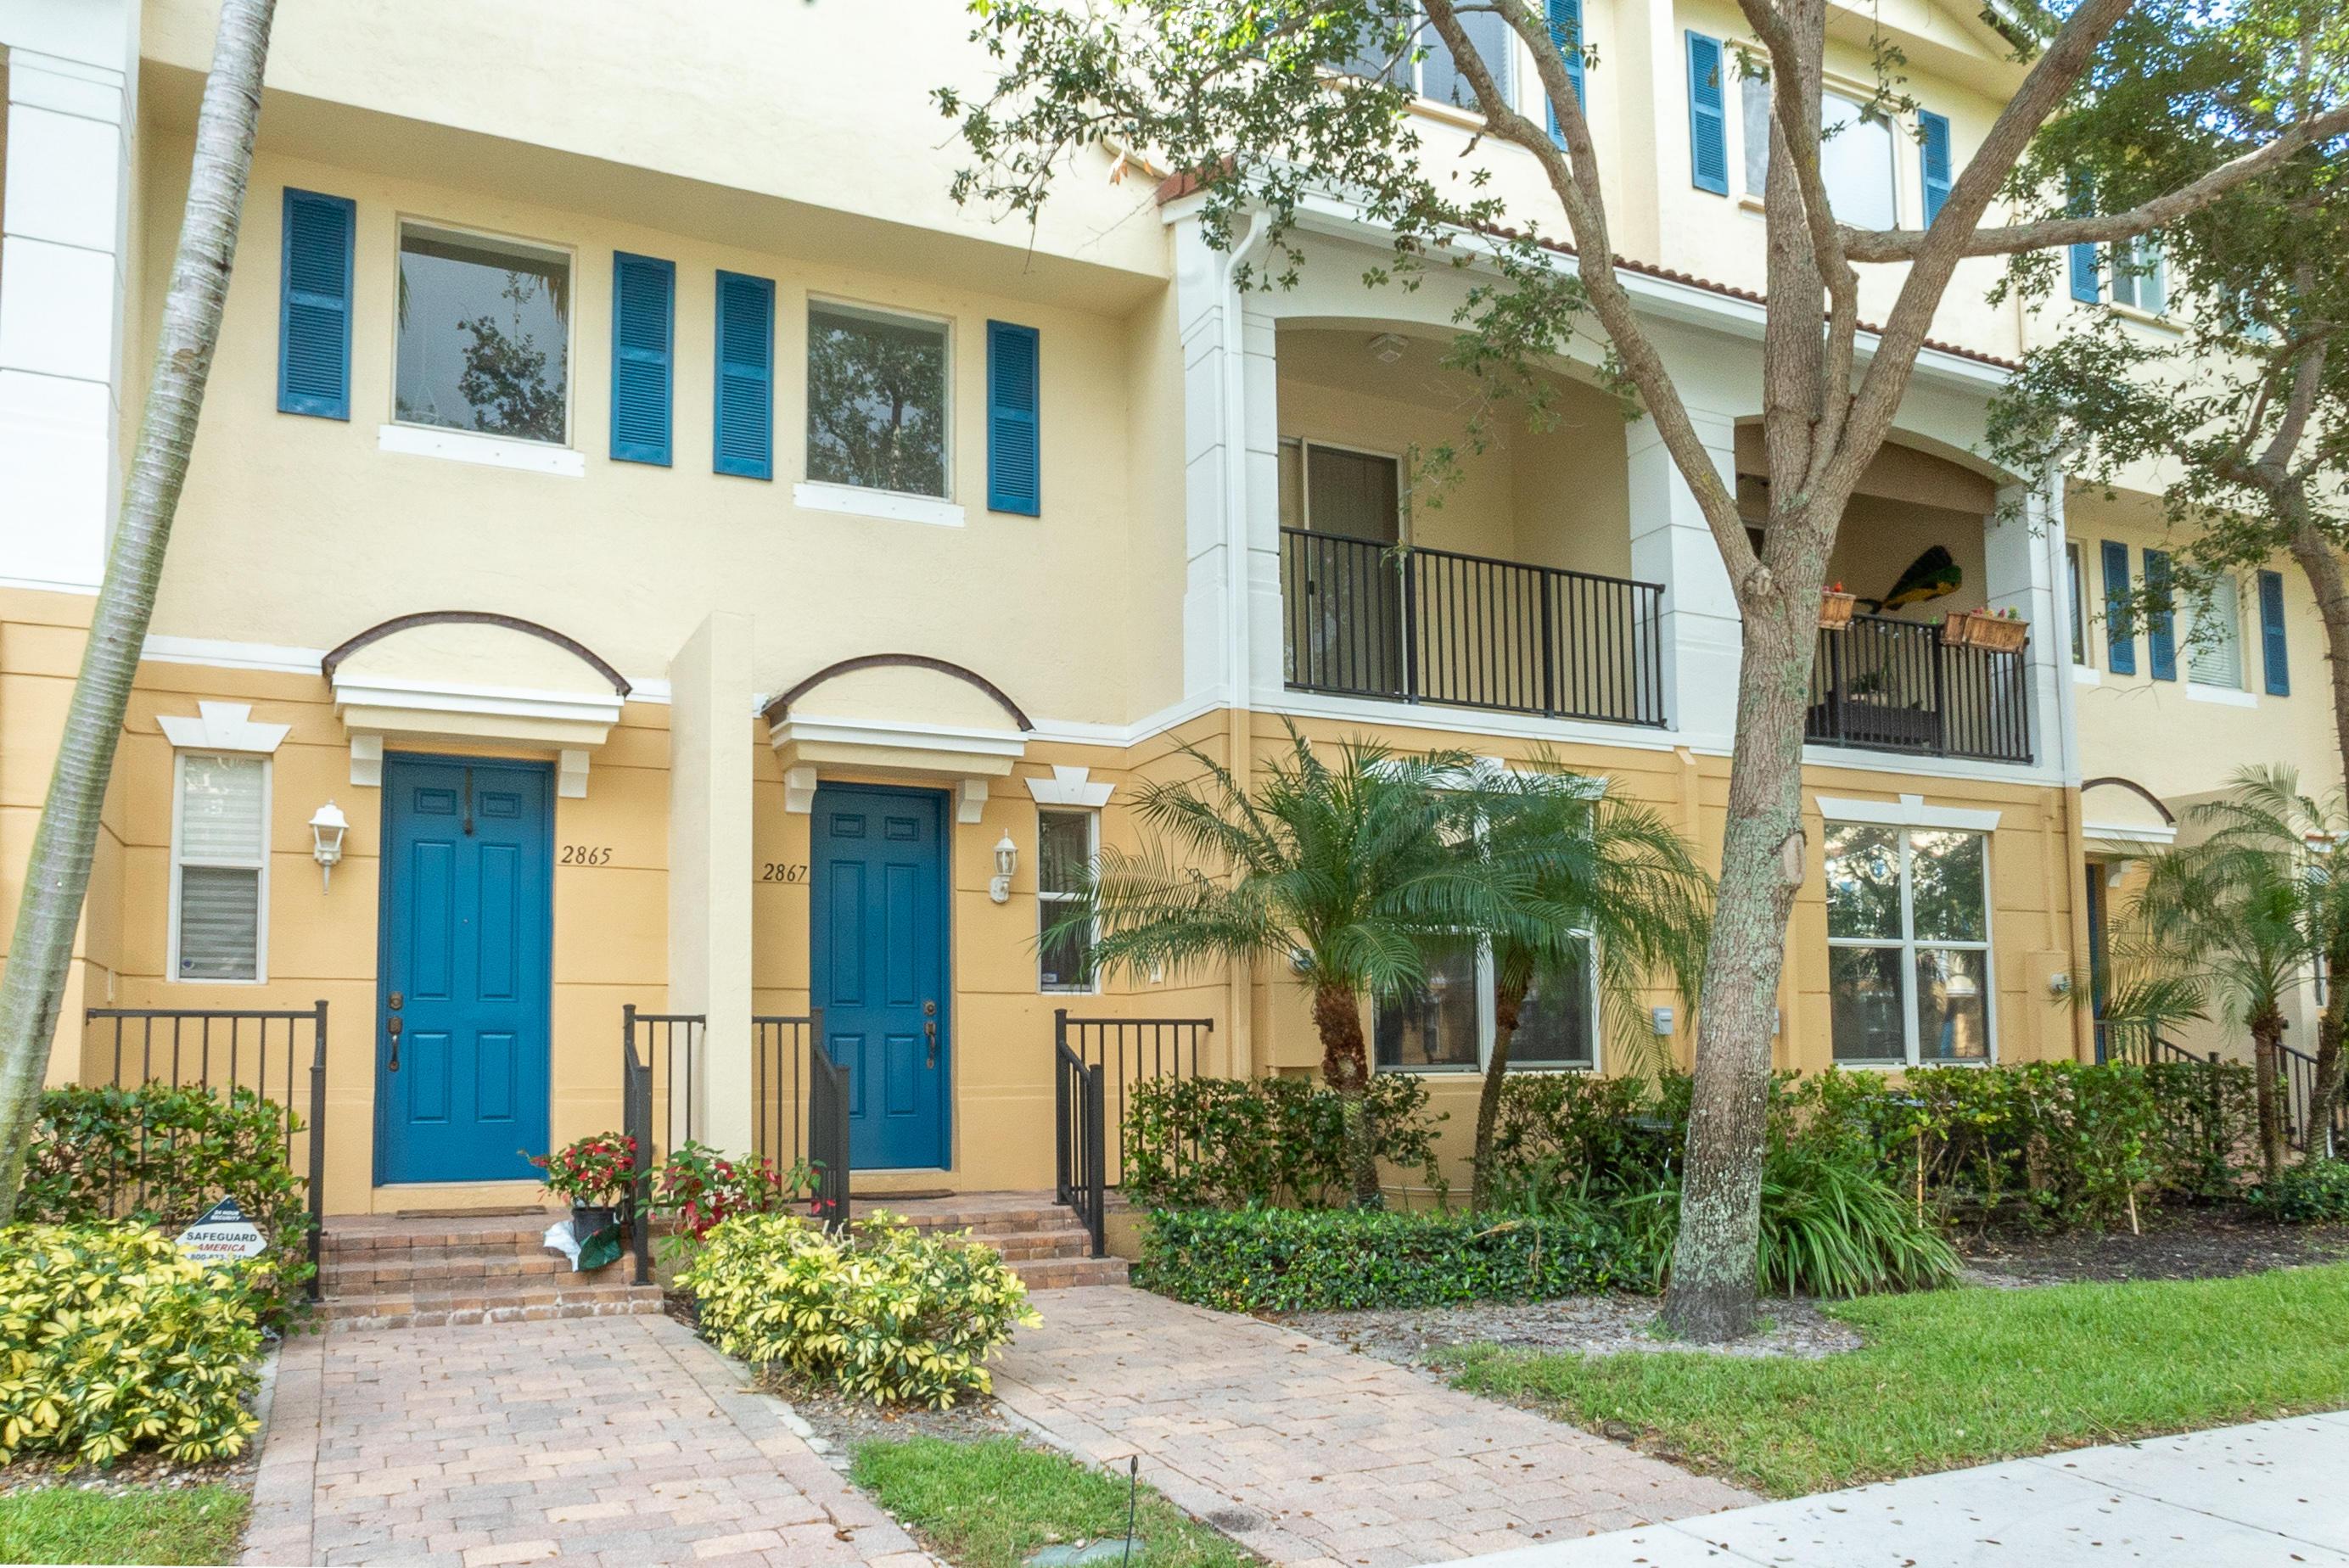 2867 S Oasis Dr Boynton Beach, FL 33426